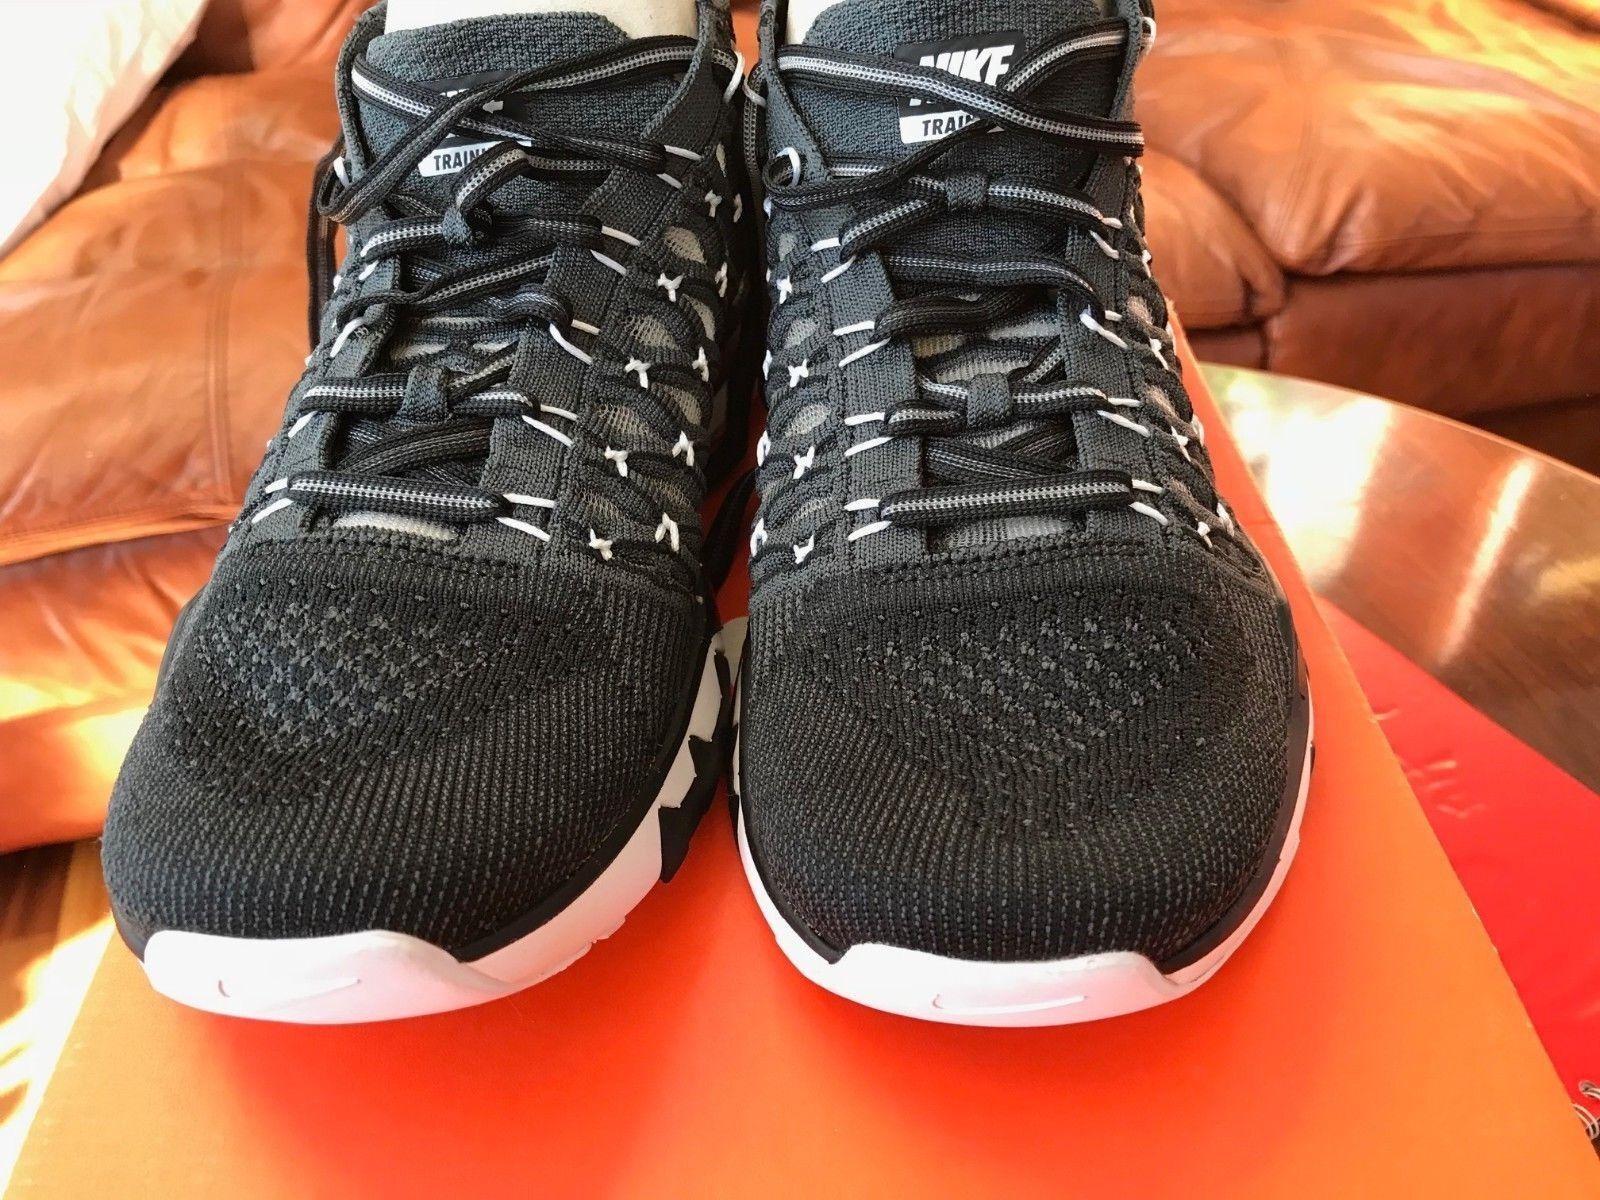 Nike men's Train Ultrafast Flyknit 843694 010 Black White sz 7 Orig 150